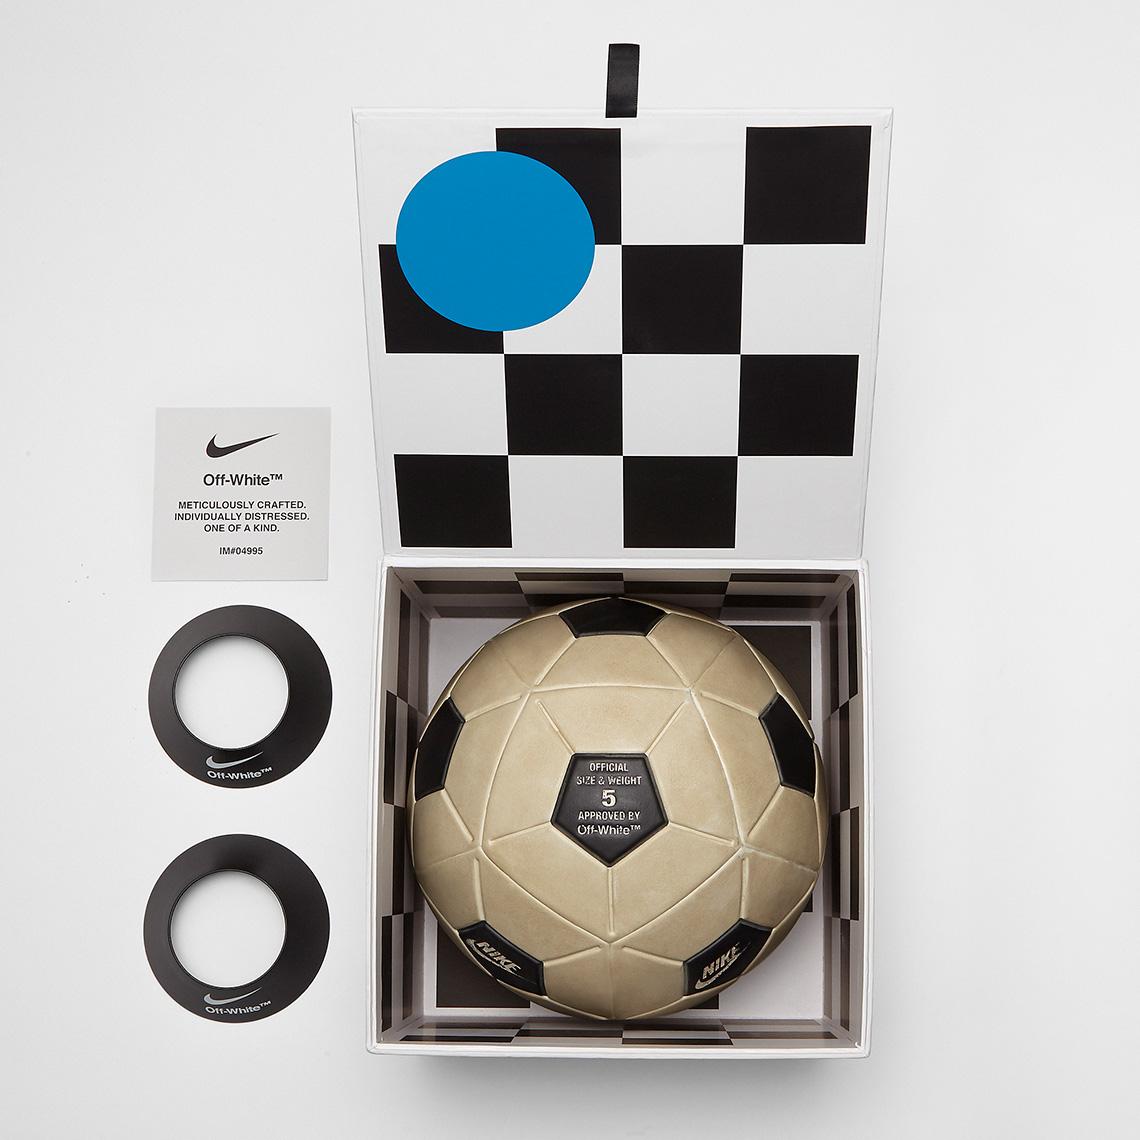 Off White Nike Football Apparel Release Info Sneakernews Com